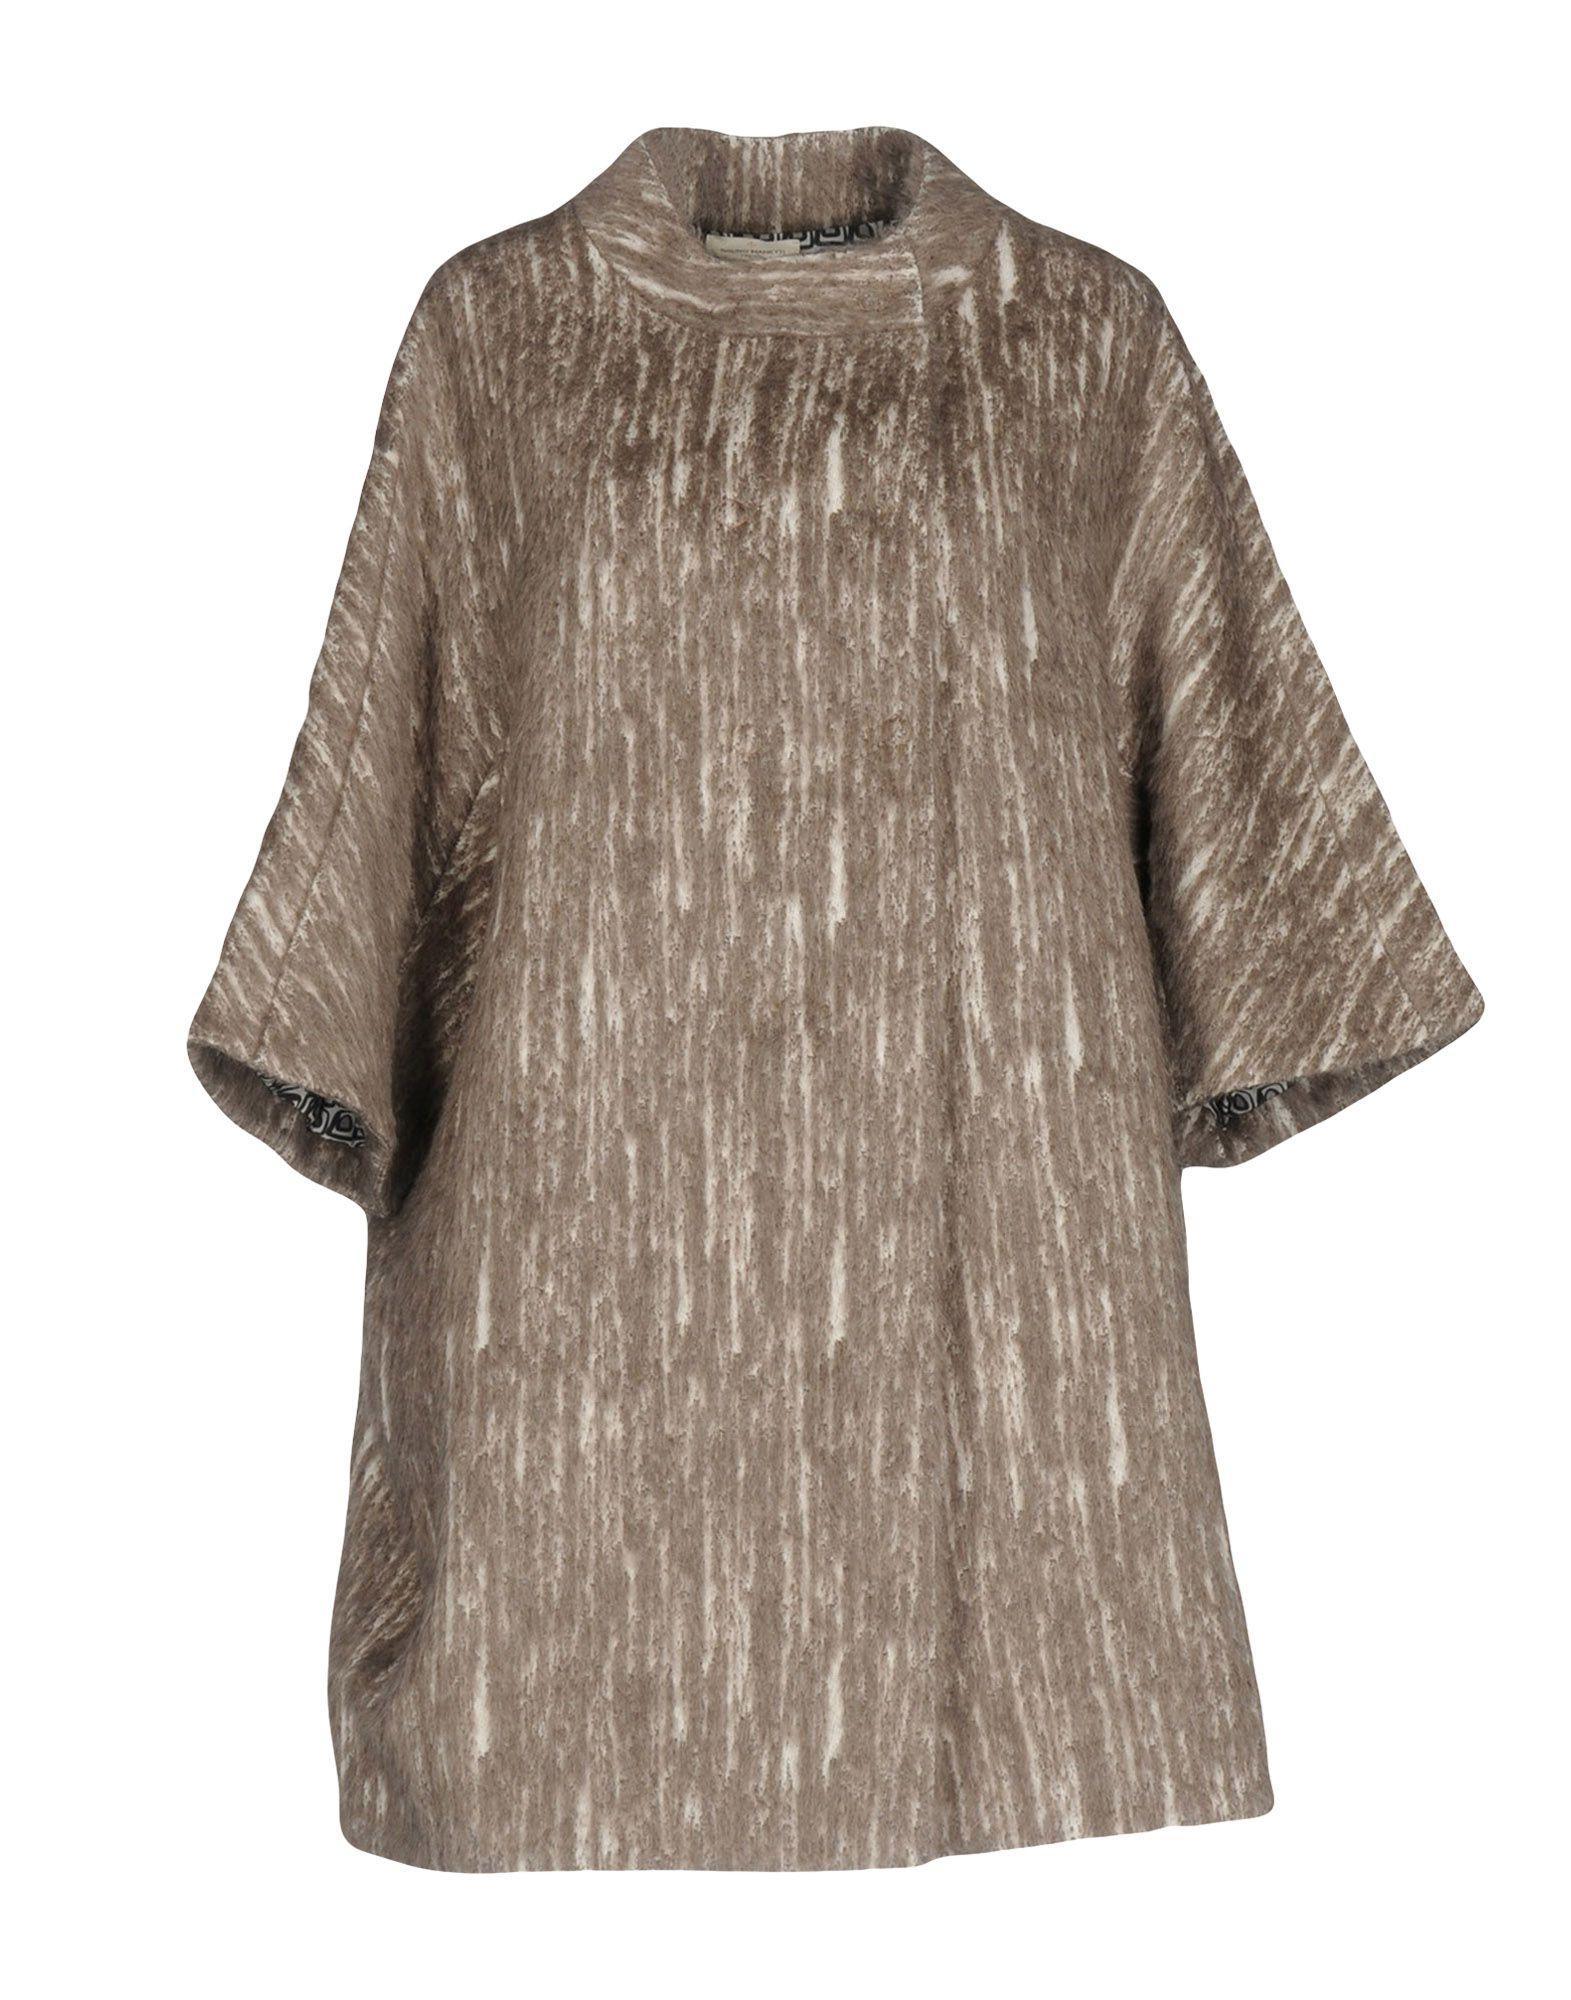 Bruno Manetti Coat In Khaki